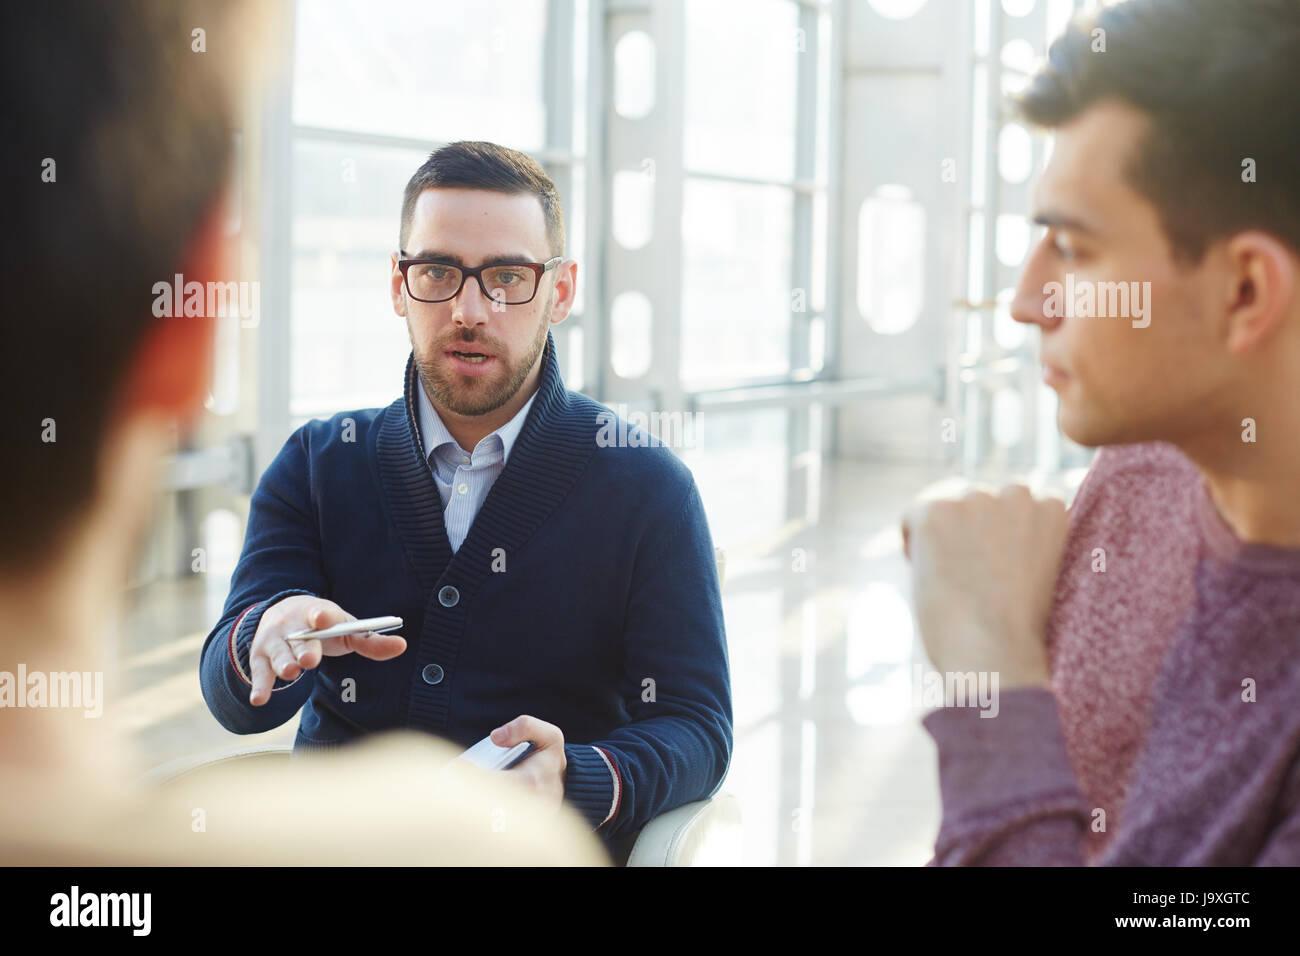 Confident ceo explaining something to one of employees - Stock Image